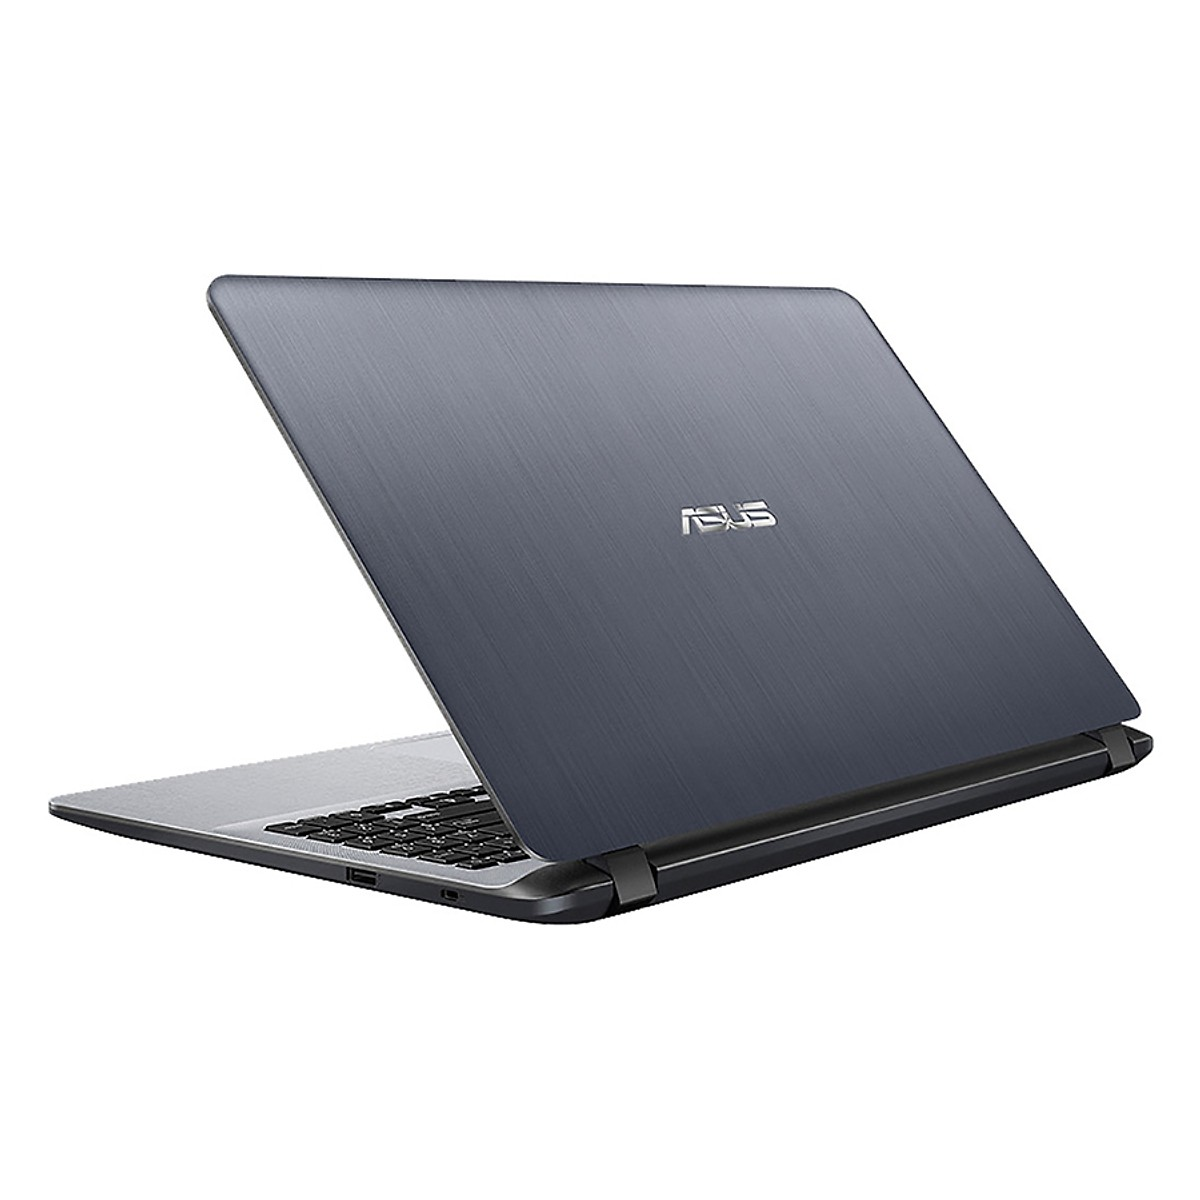 Asus   Máy tính xách tay - Laptop    Laptop Asus Vivobook X507UF-EJ079T Core i7-8550U/ Win10 (15.6